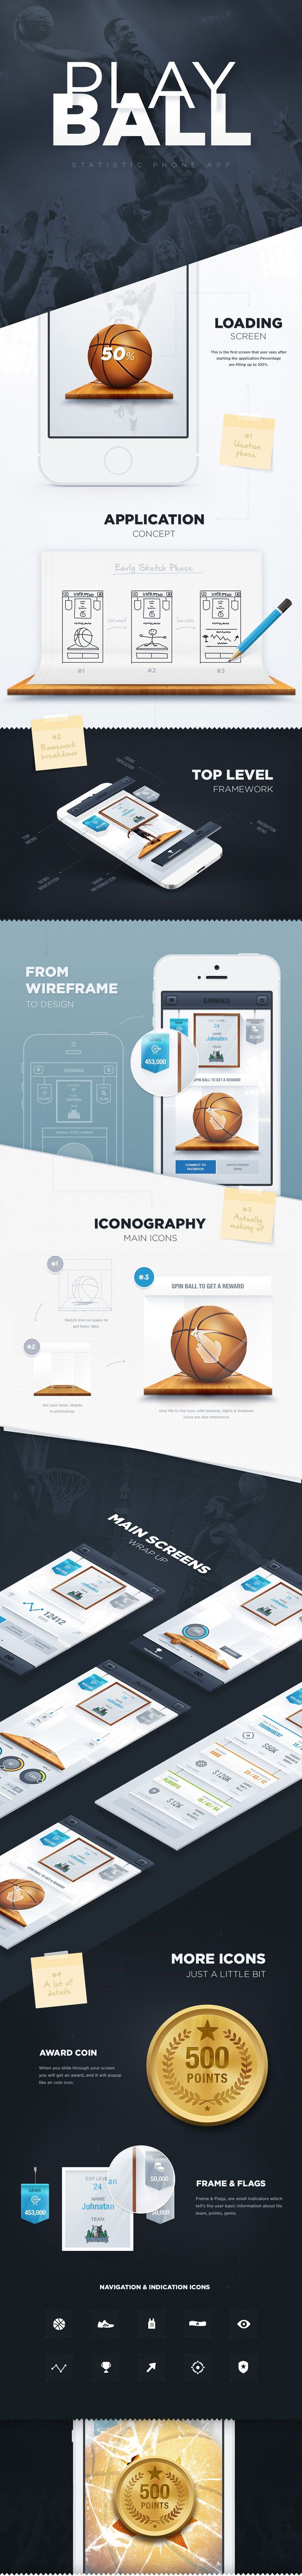 PLAYBALL #webdesign #responsivedesign #ui #ux